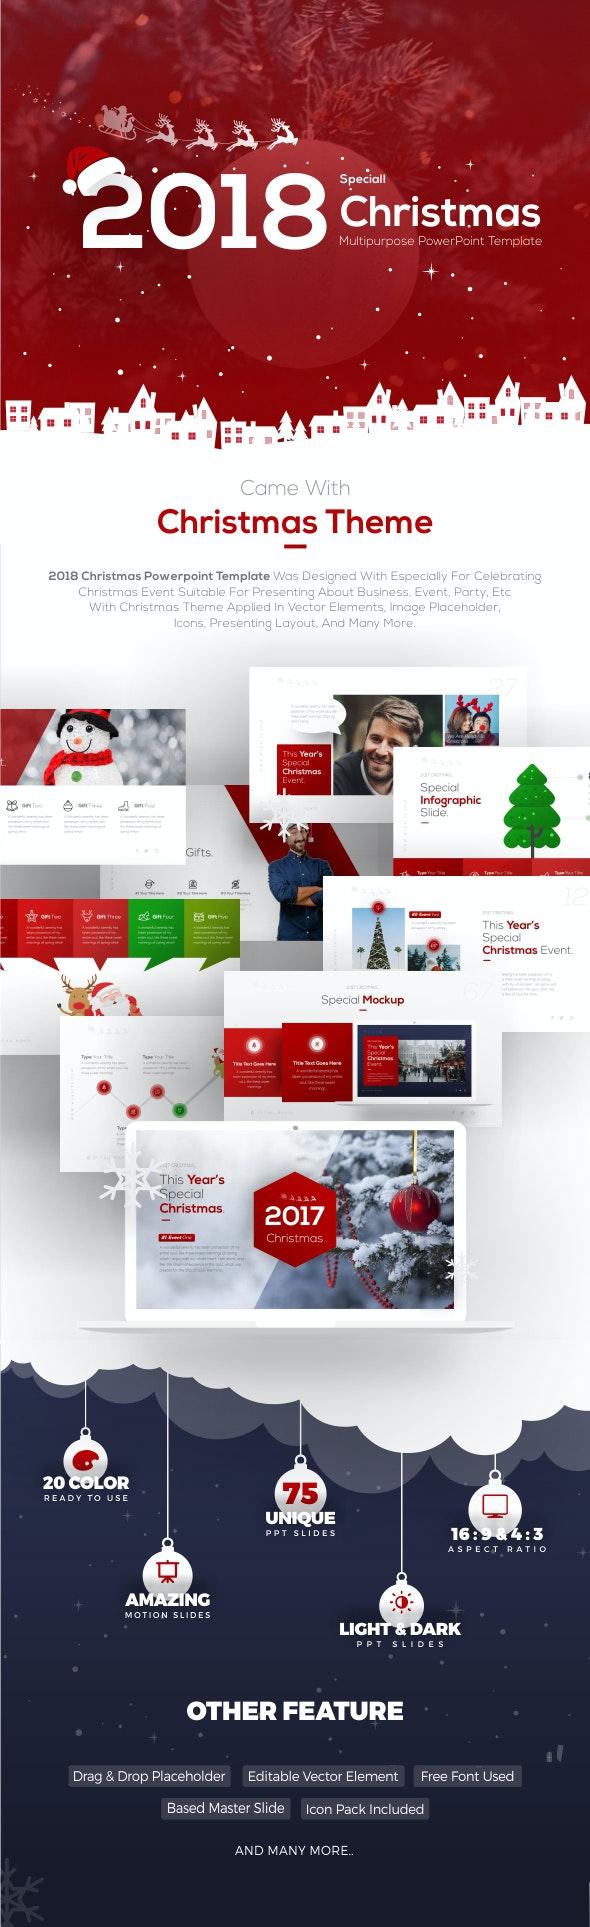 2018 Christmas Multipurpose Presentation Template - Business PowerPoint Templates